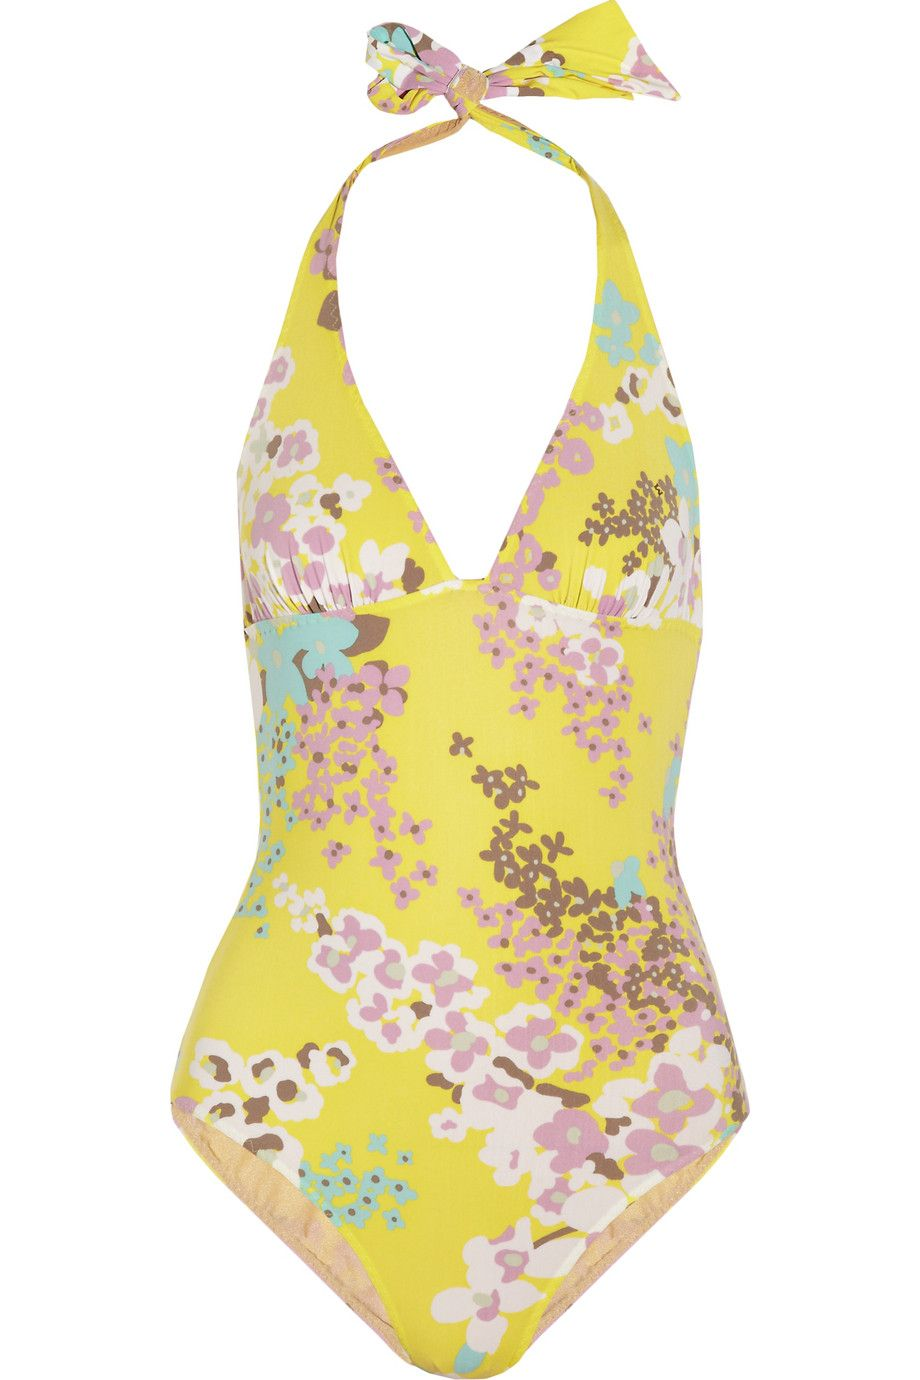 b2647a52322 Discount designer clothes for women sale. Floral-print swimsuit by M Missoni